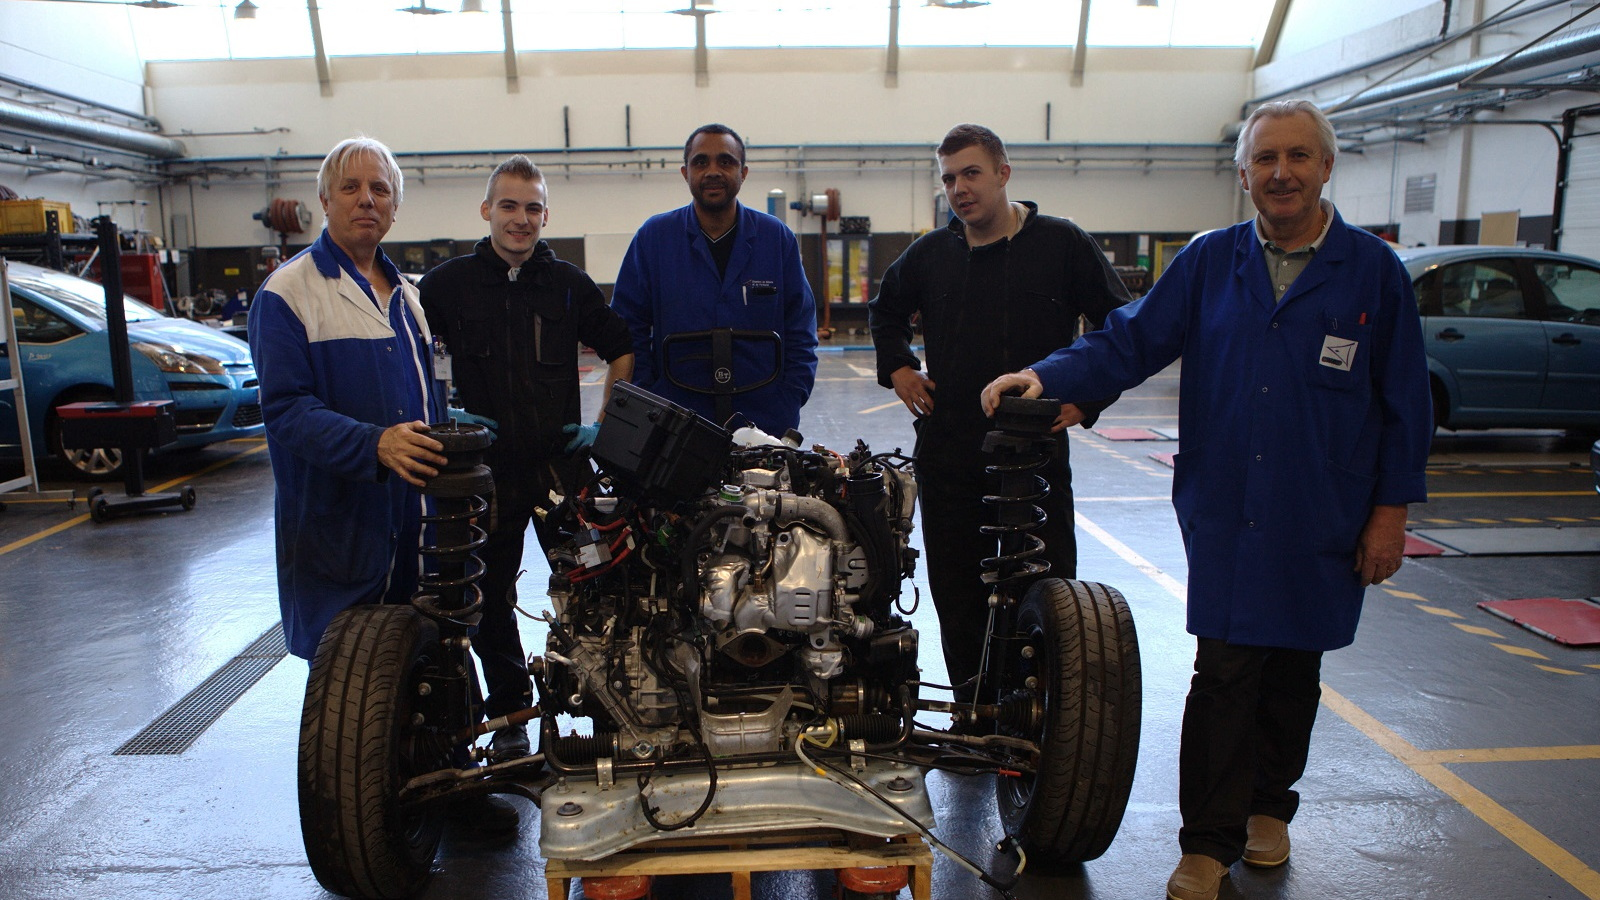 French startup Carwatt converts Renault Trafic diesel van to electric power [Carwatt, Fabien Berger]